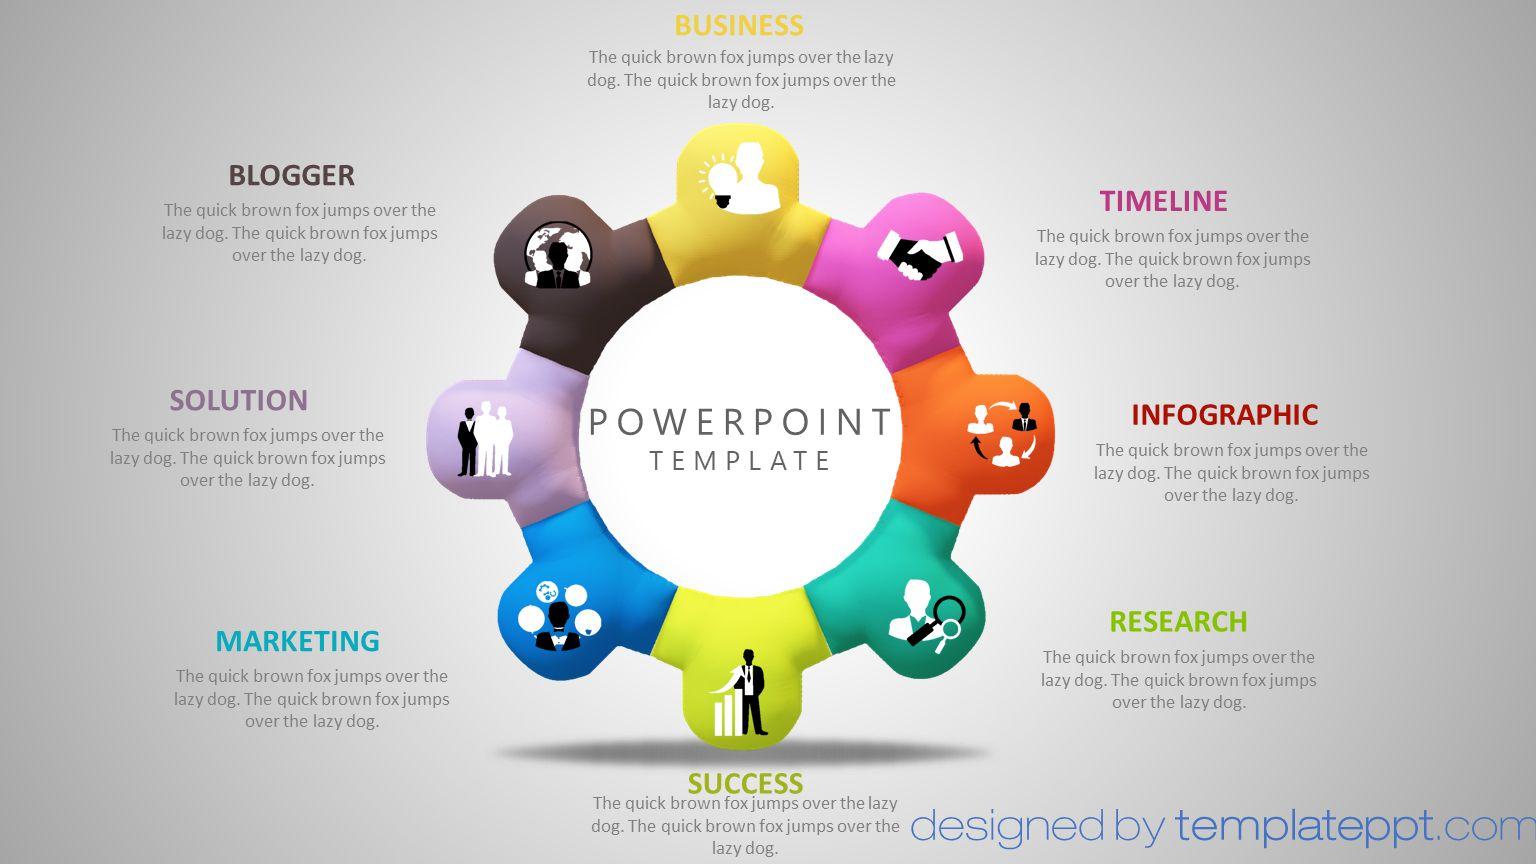 The Charming 3d Powerpoint Presentation Animation Effects Free Download For Powerpoint Powerpoint Template Free Infographic Powerpoint Powerpoint Presentation